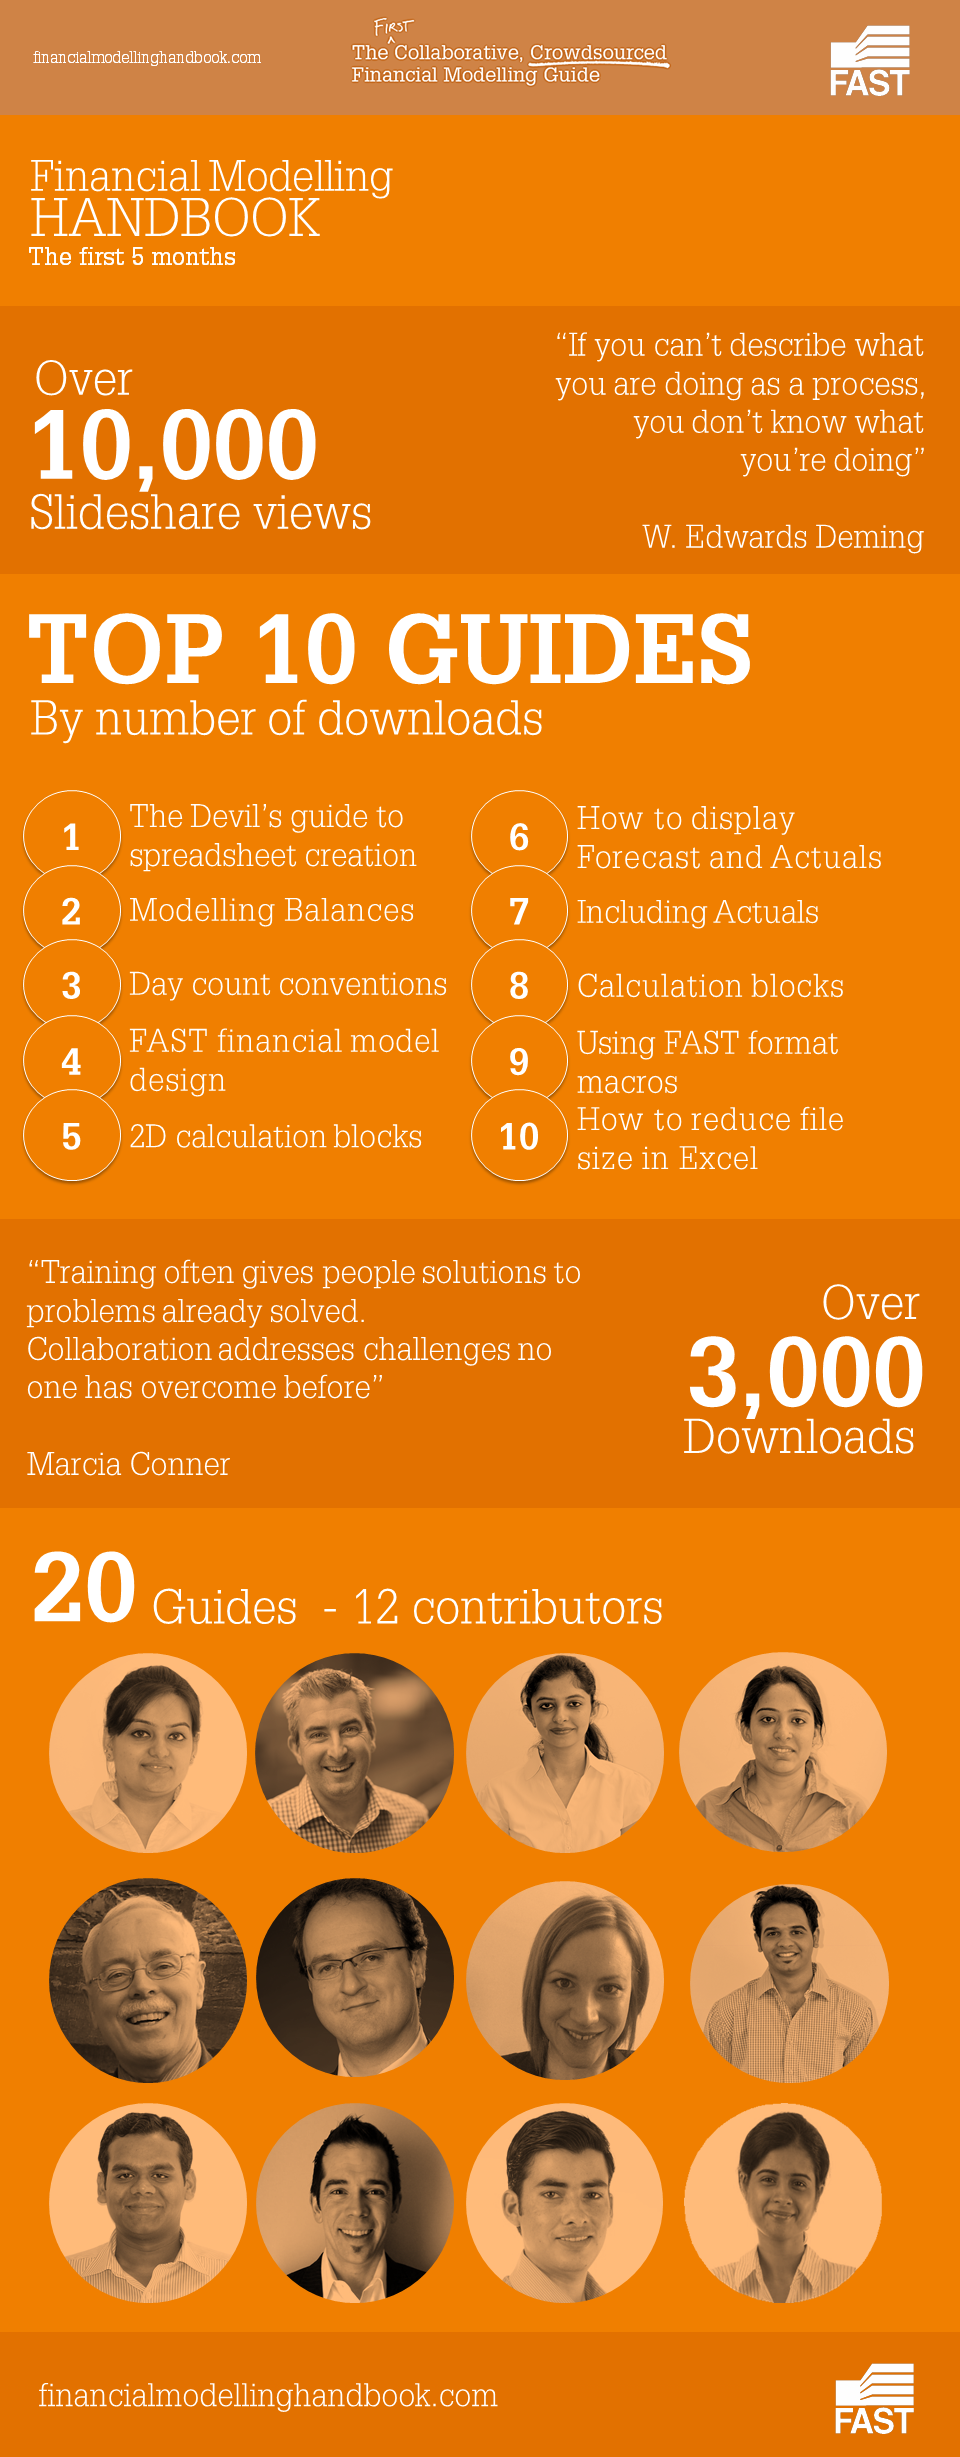 FMH_Infographic2